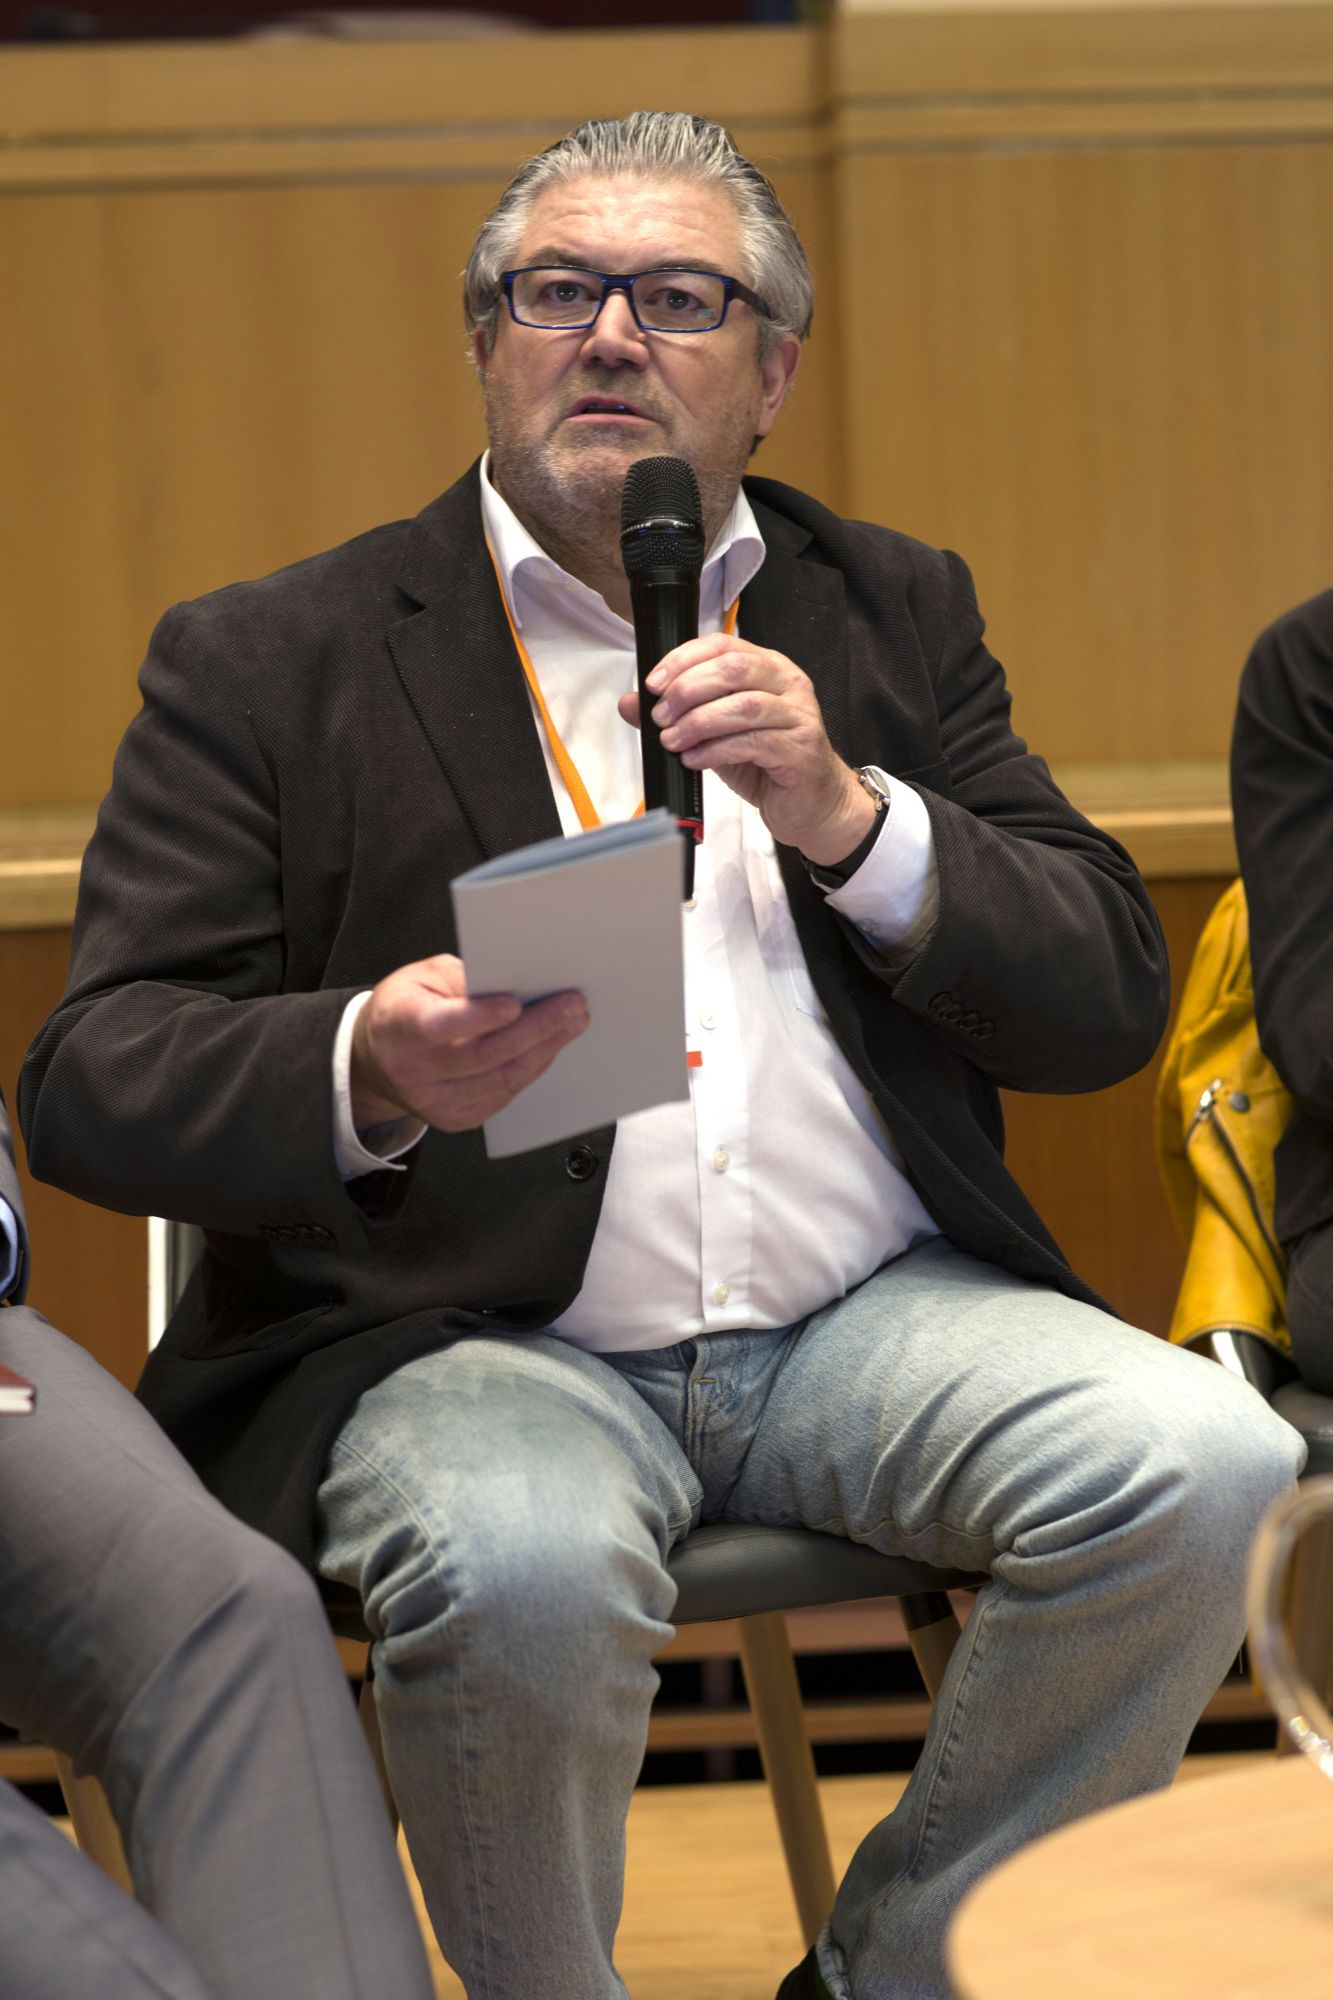 Éric CHEVAILLIER